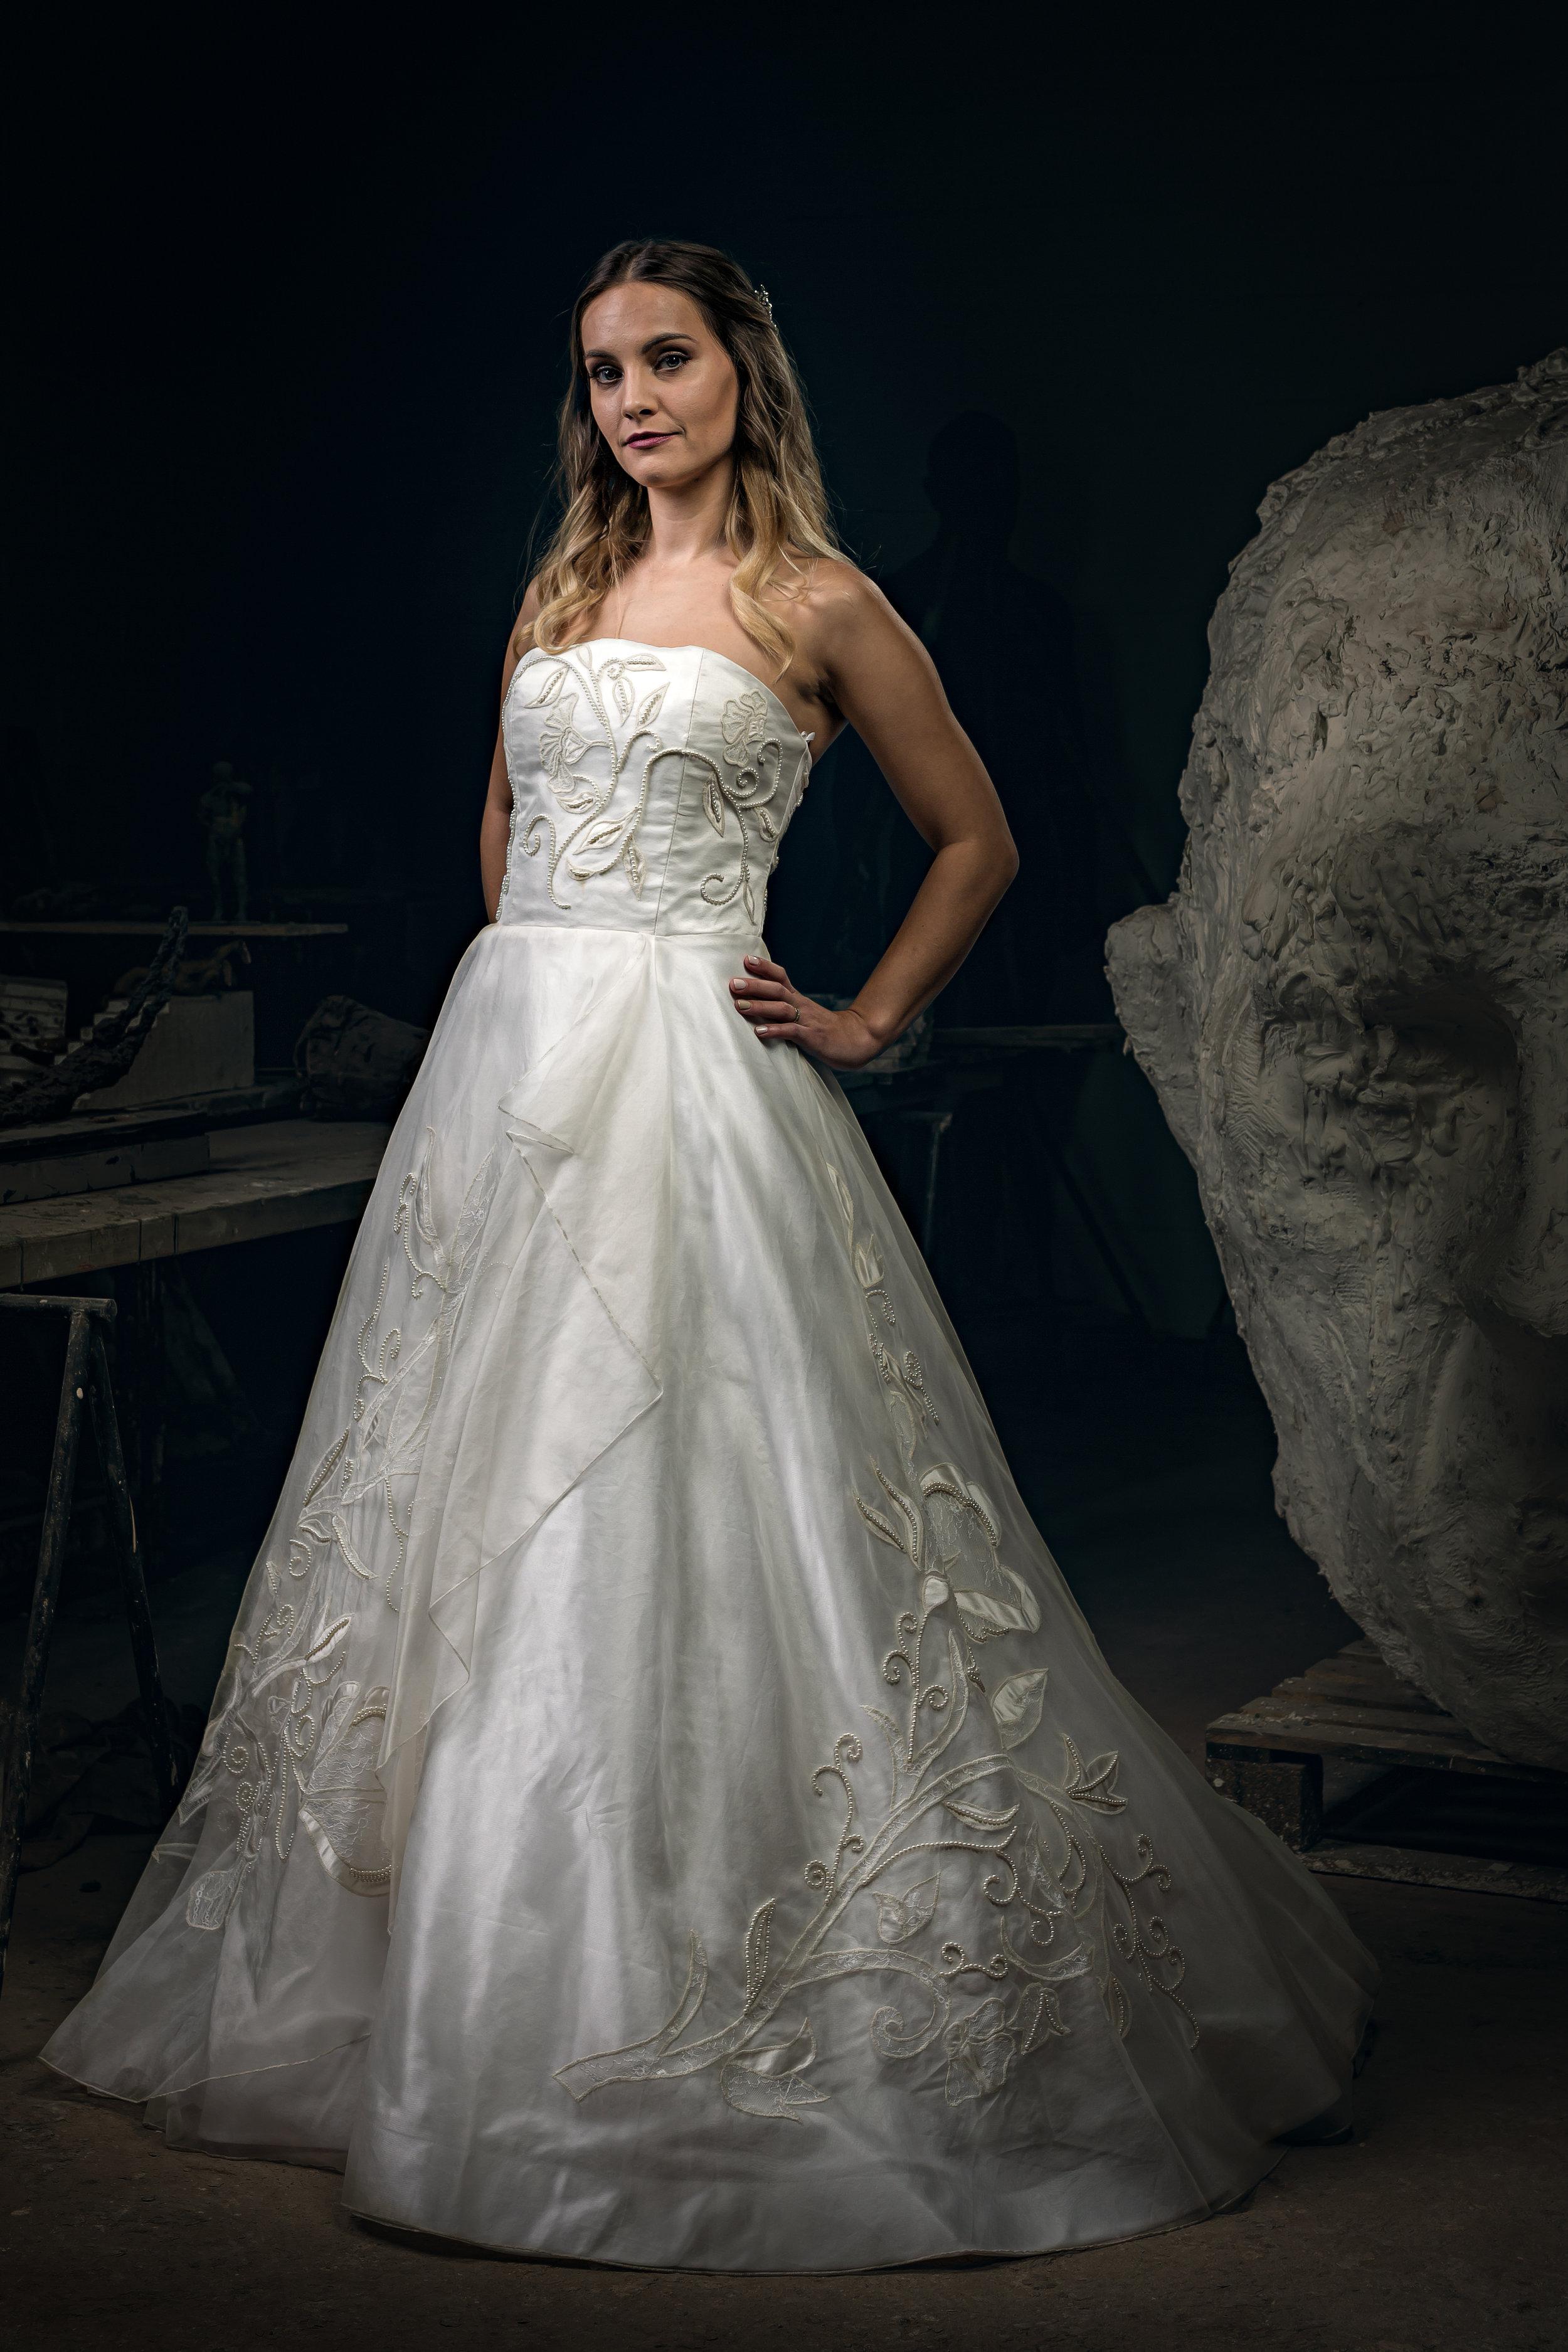 Martin Dobson Couture - Bespoke wedding dress - Suffolk - 0468 - September 17, 2017 - copyright Foyers Photography-Edit--® Robert Foyers - All Rights Reserved-3163 x 4744.JPG